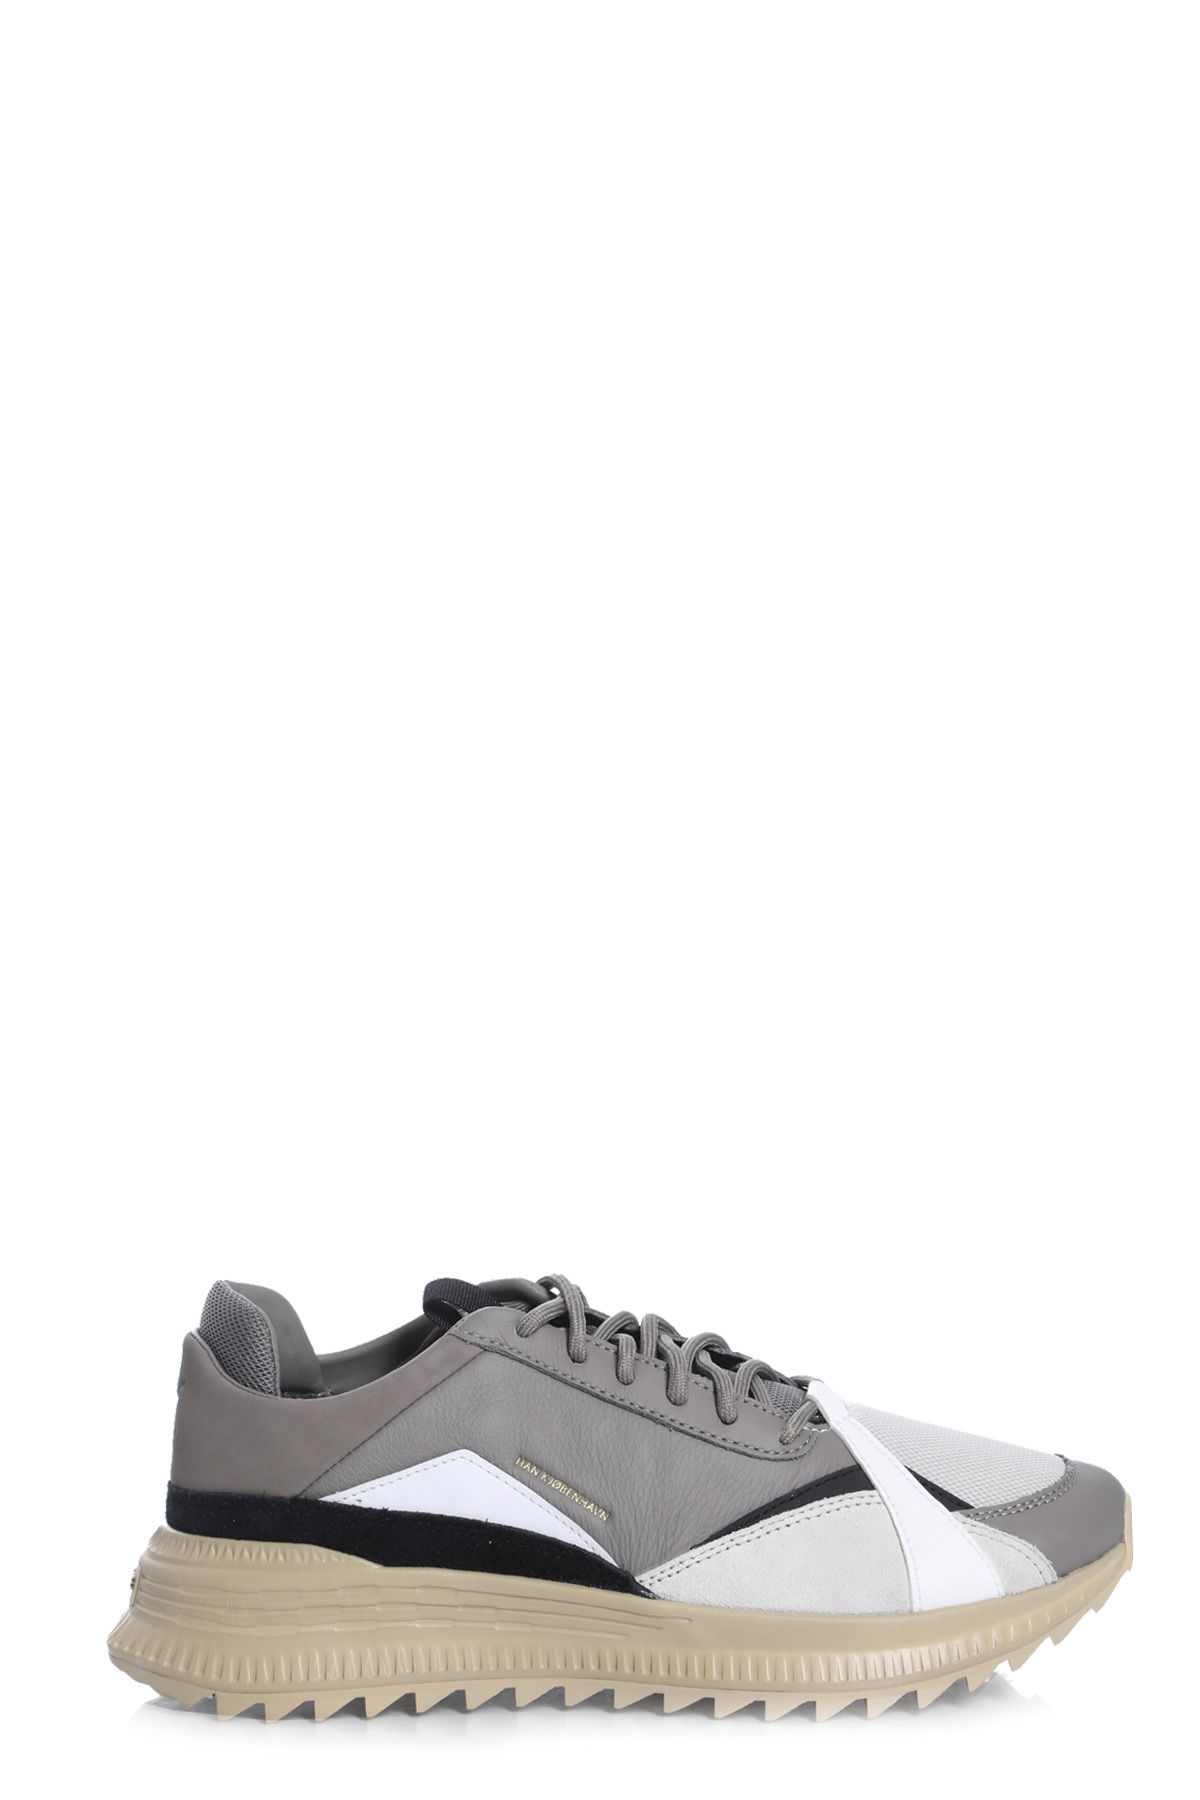 PUMA X HAN KJOBENHAVN Sneakers in Grigio/Safari